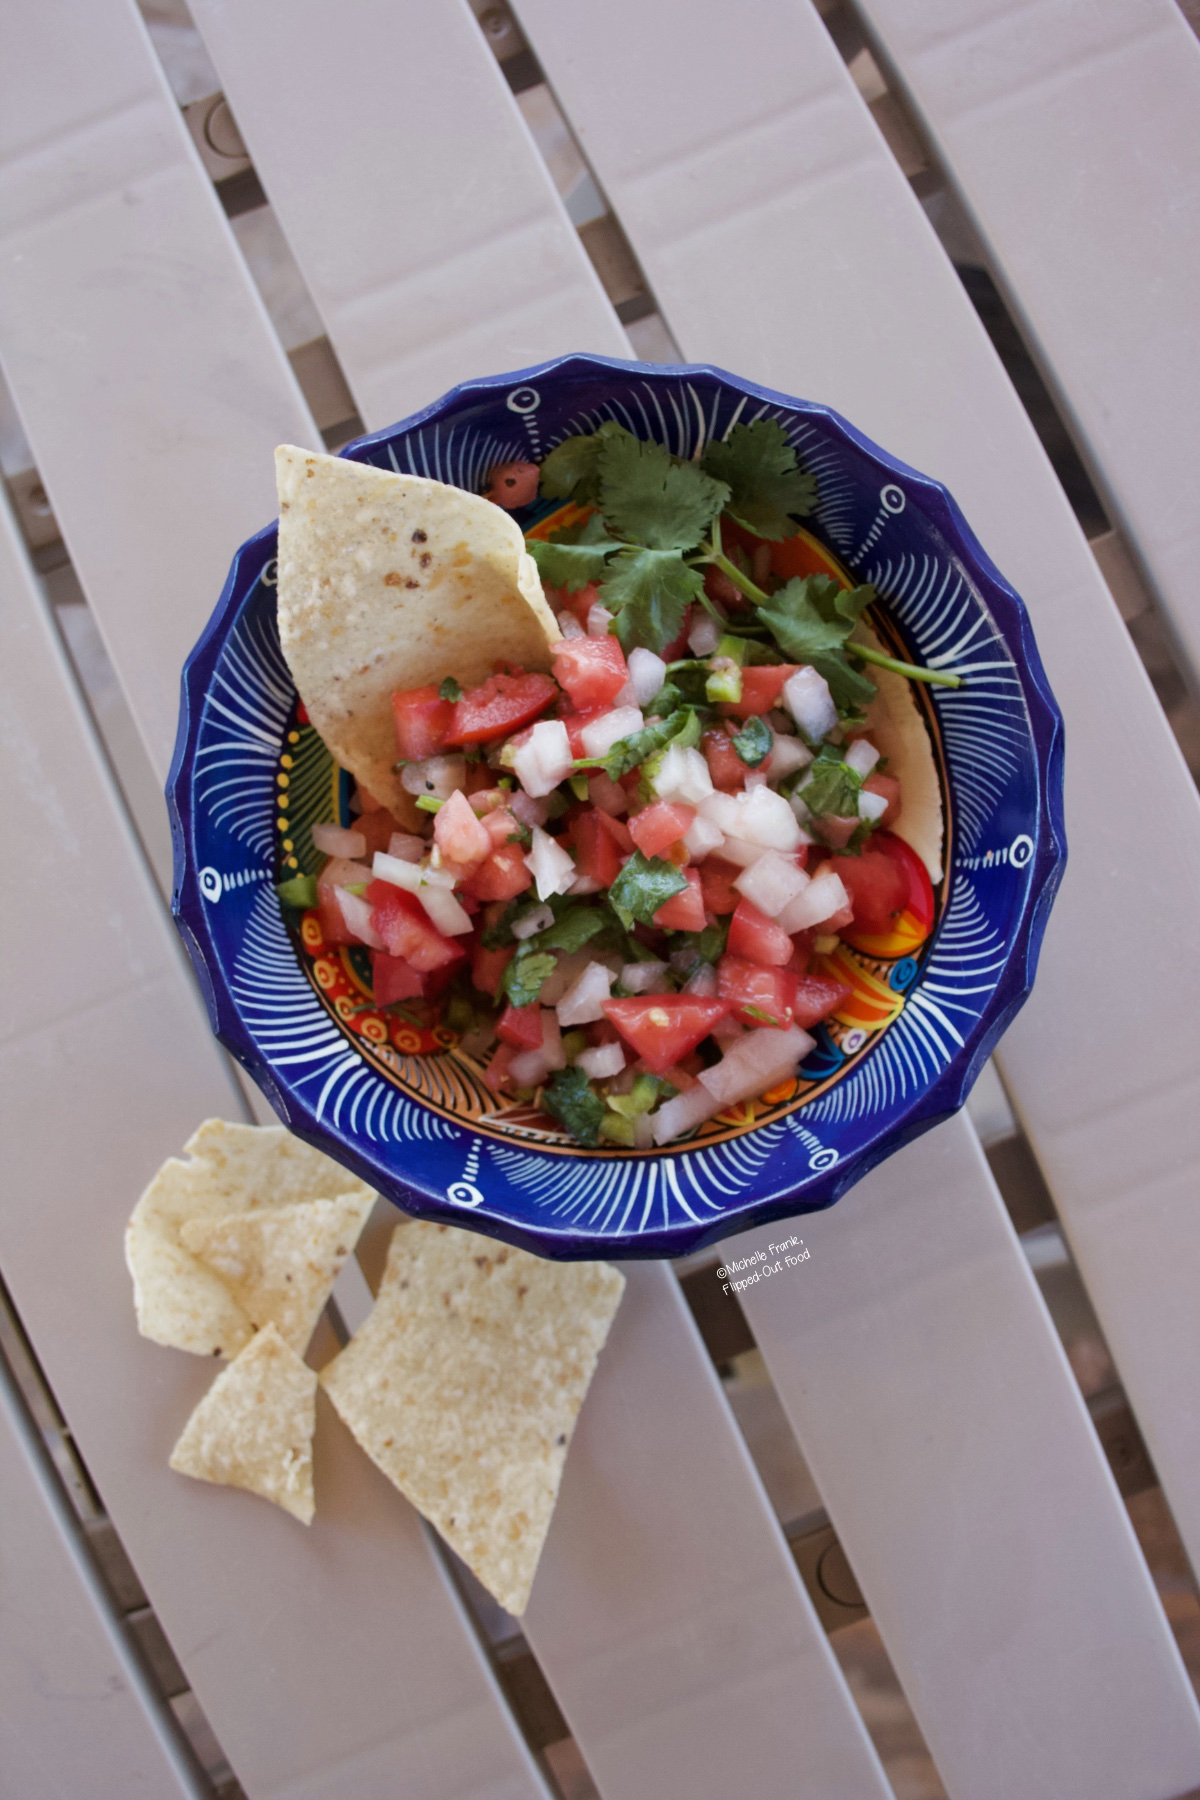 Pico de gallo in a decorative blue bowl sitting atop a patio table. A tortilla chip has been stuck into the pico de gallo, and more tortilla chips await close by.